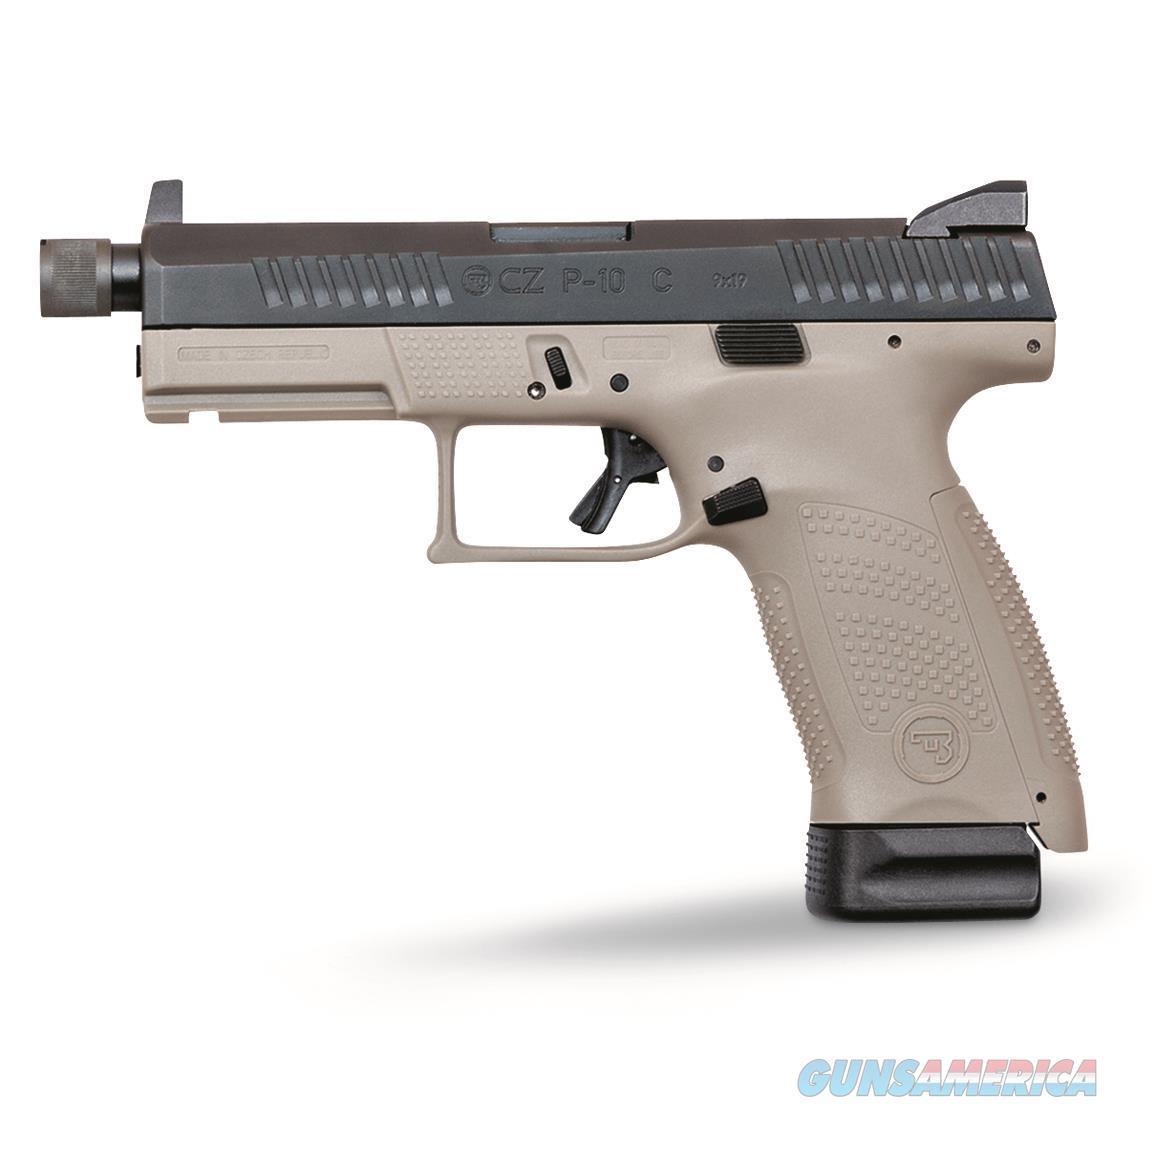 CZ P-10 C 9MM Urban Grey Suppressor-Ready  Guns > Pistols > CZ Pistols